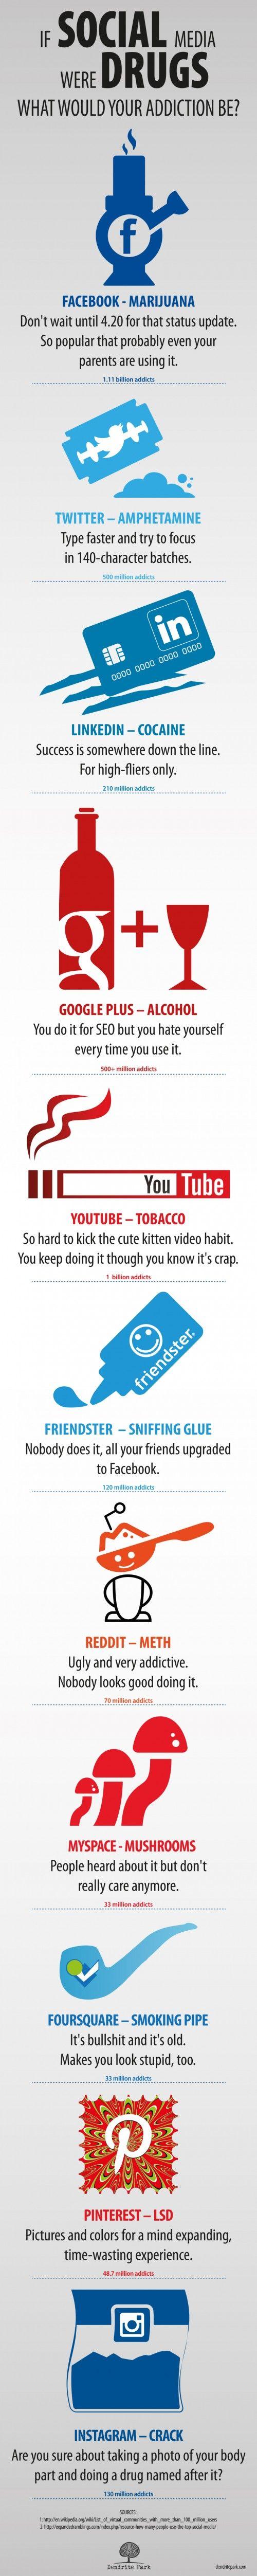 Oweia! Wenn soziale Netzwerke Drogen wären? #Infografik via dentripark.com